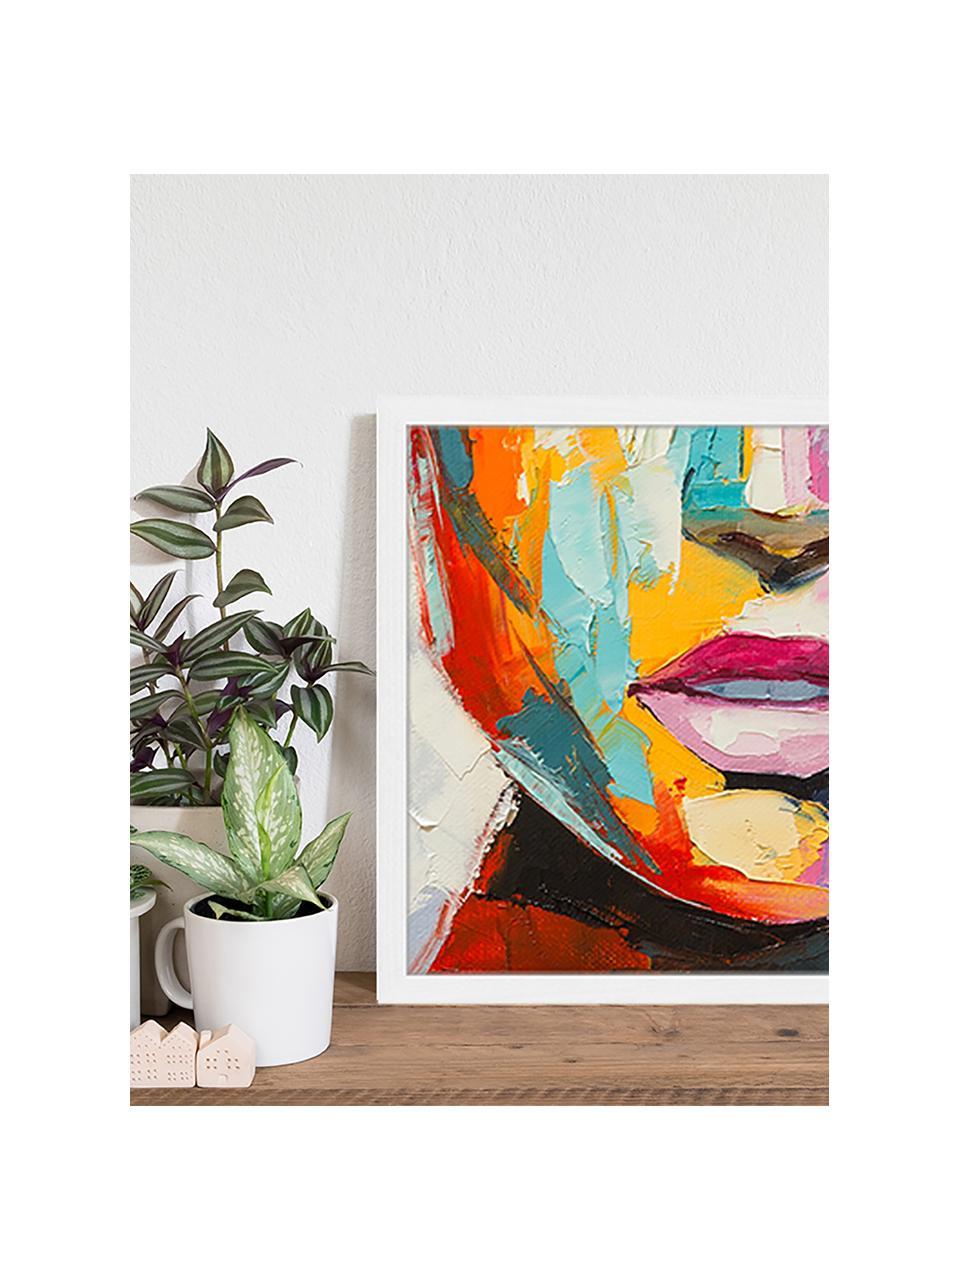 Gerahmter Digitaldruck Colorful Emotions, Bild: Digitaldruck auf Papier, , Rahmen: Holz, lackiert, Front: Plexiglas, Mehrfarbig, 53 x 43 cm